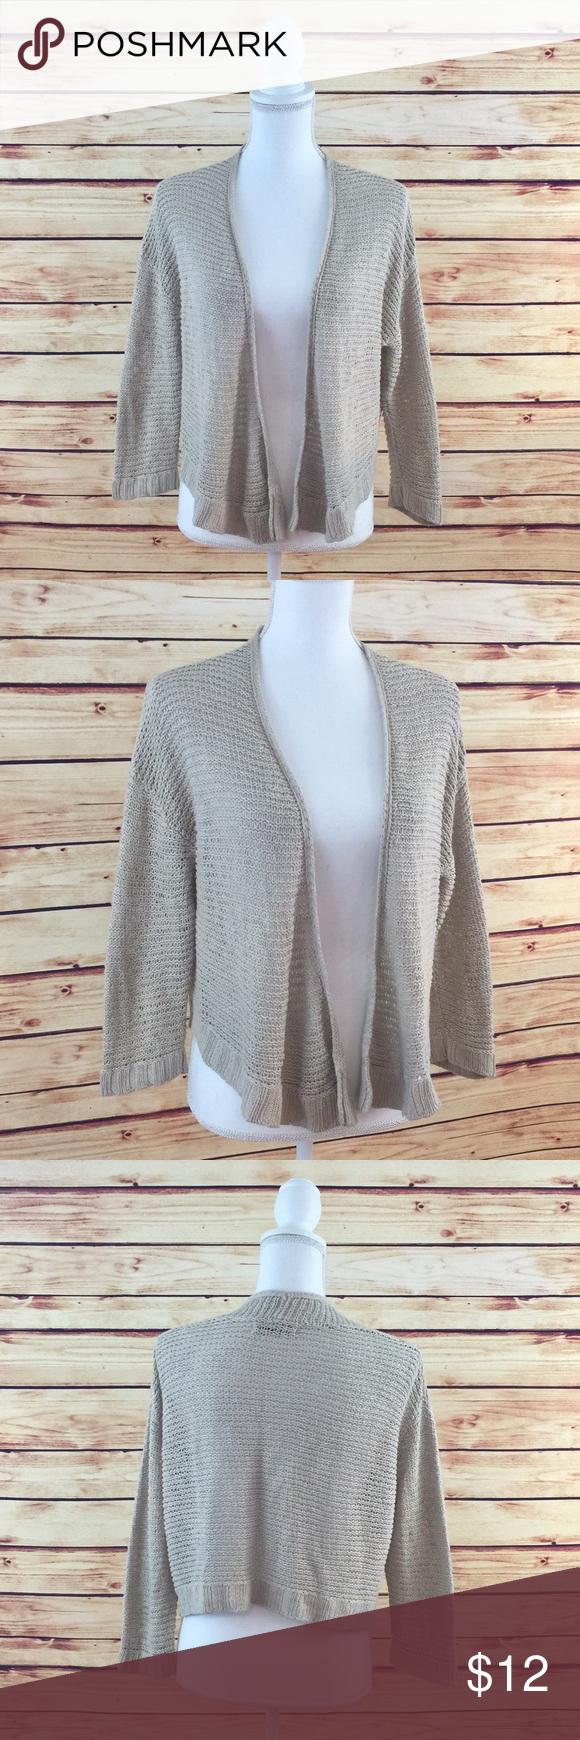 Bundle 6 for $25 • Tan Shrug Cardigan Sweater 🔹BUNDLE any 👉🏻 6 ...